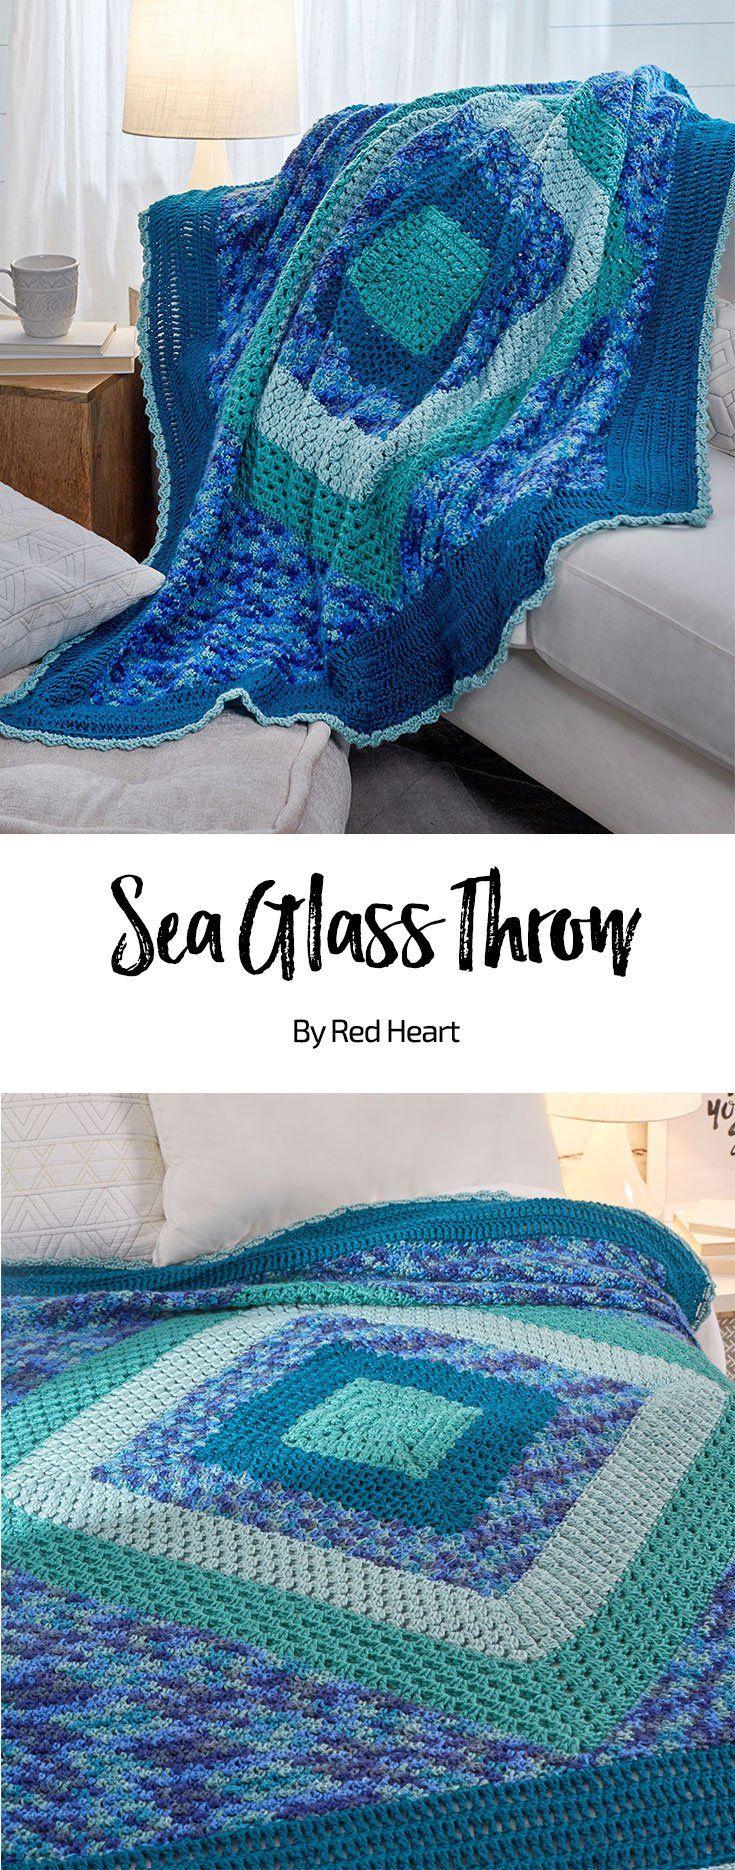 Sea Glass Throw free crochet pattern in Soft yarn.